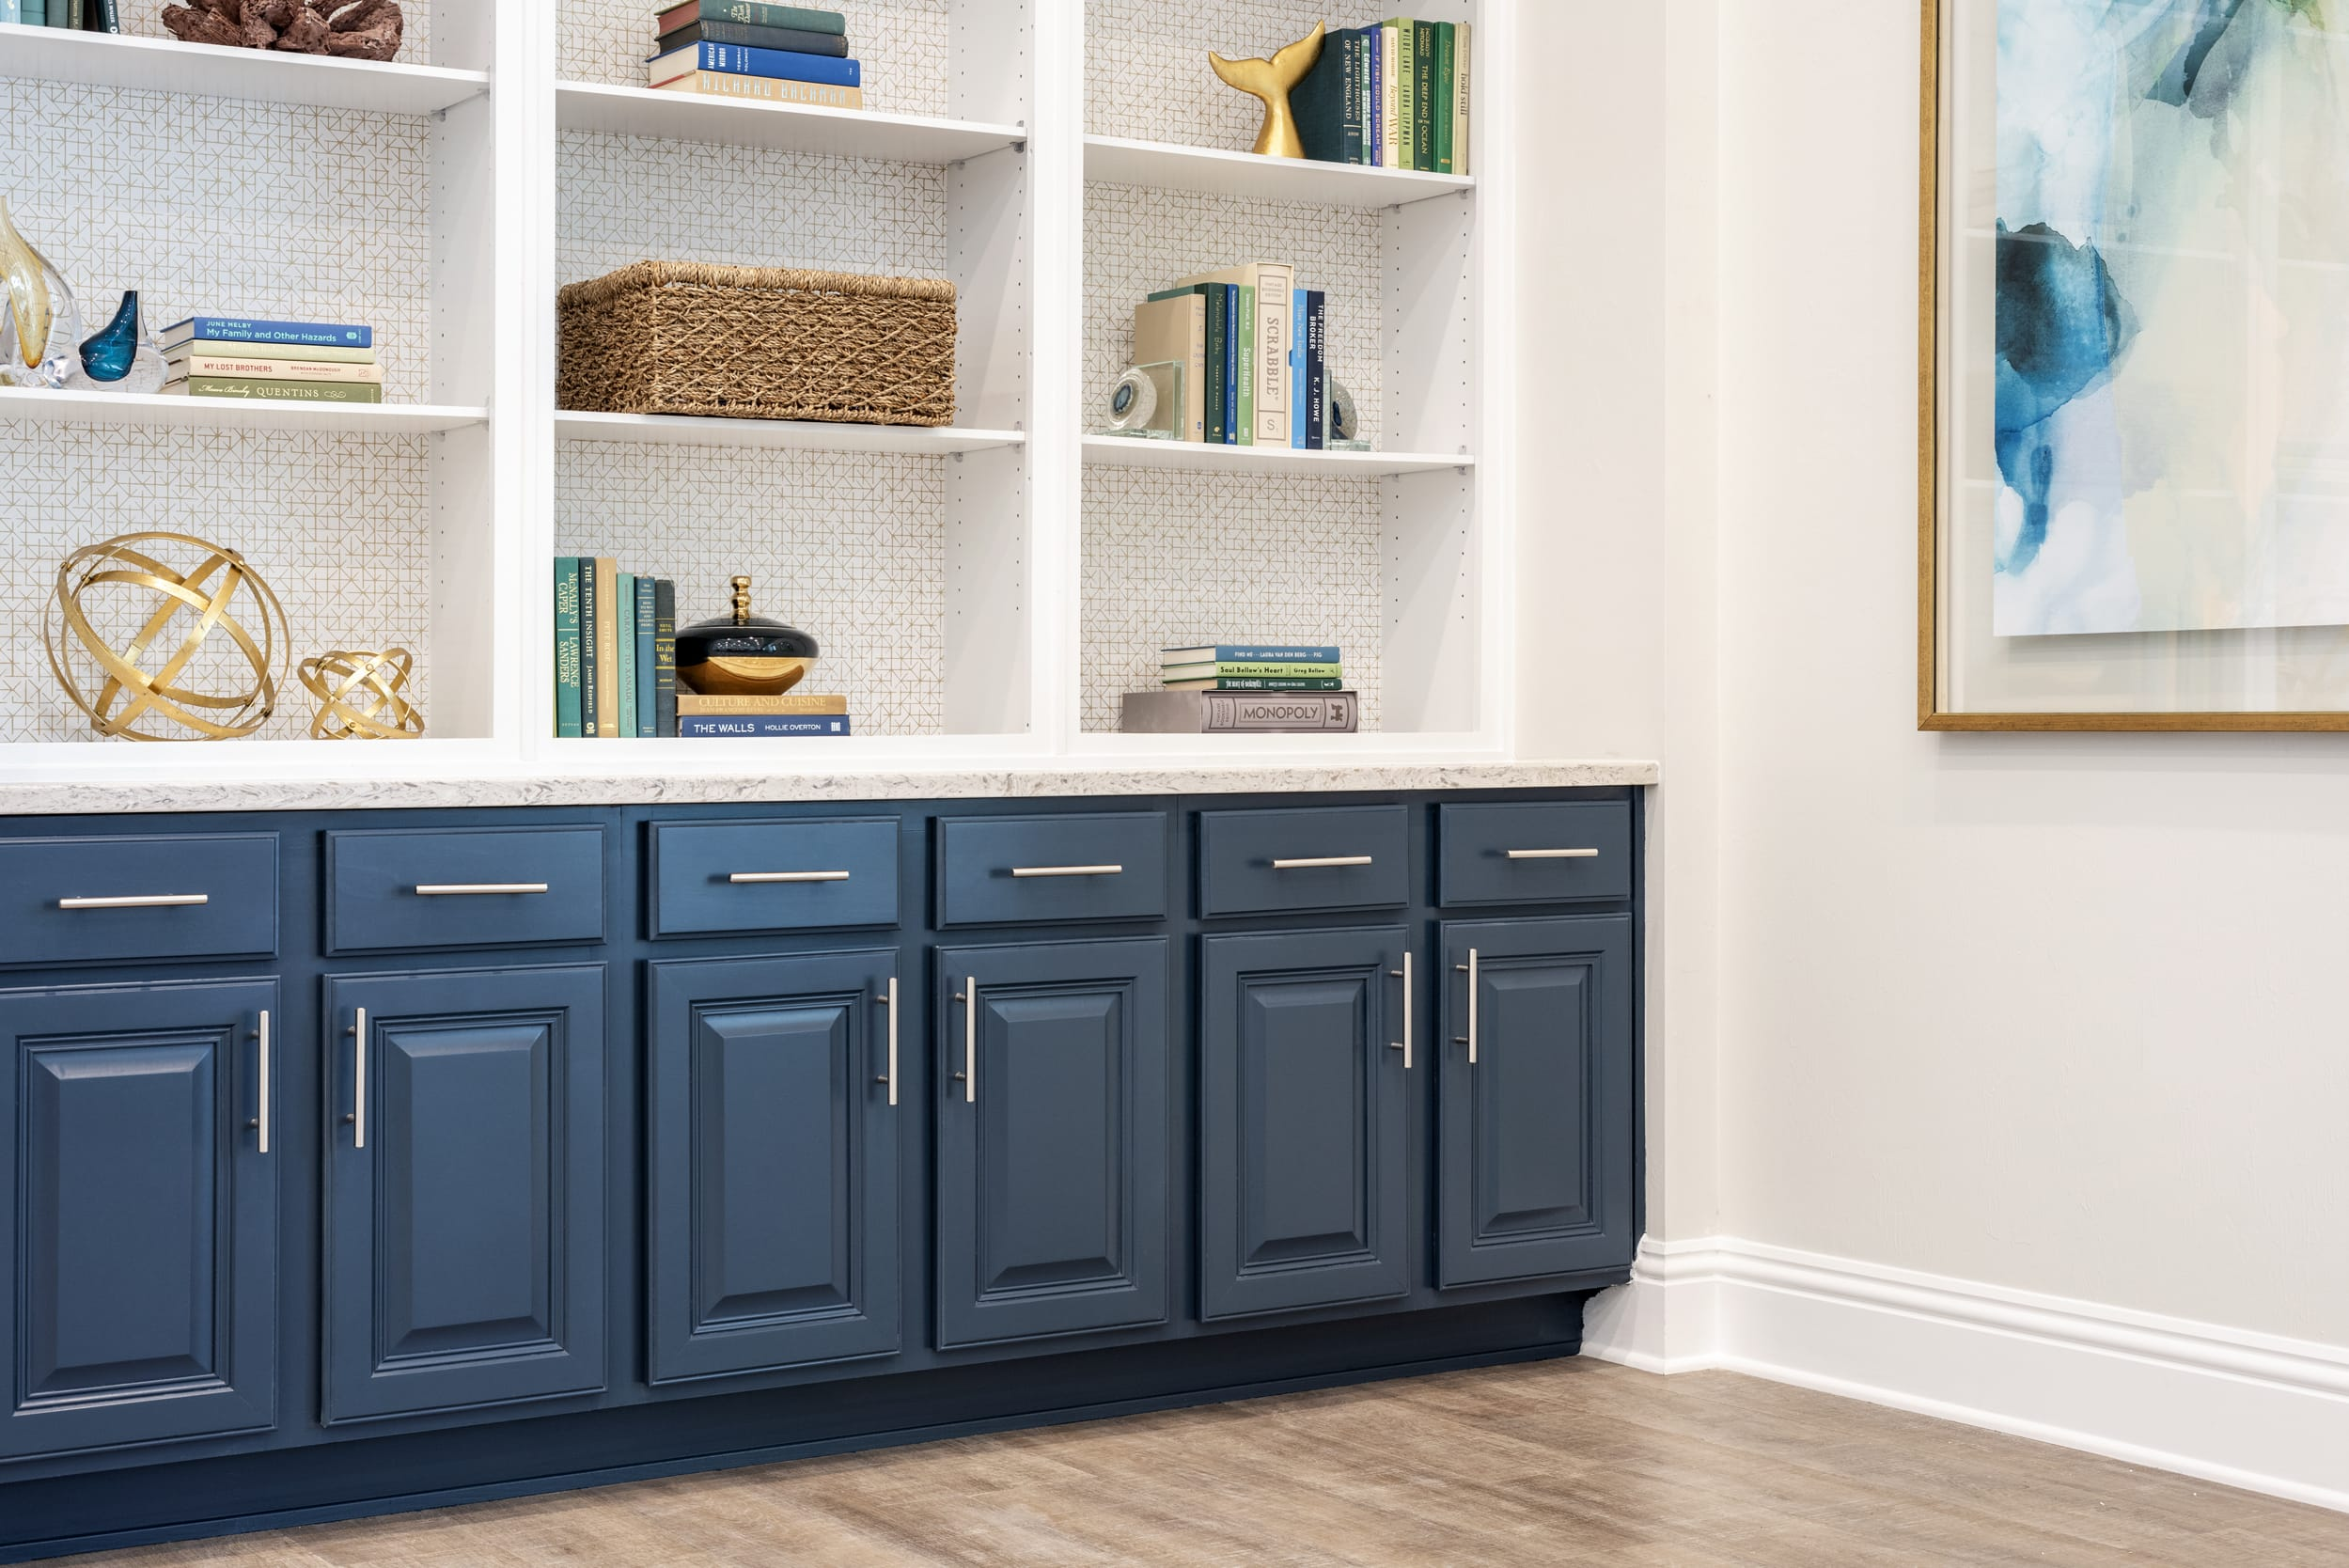 Studio121 Savona Club House Dark Blue Cabinets Artwork